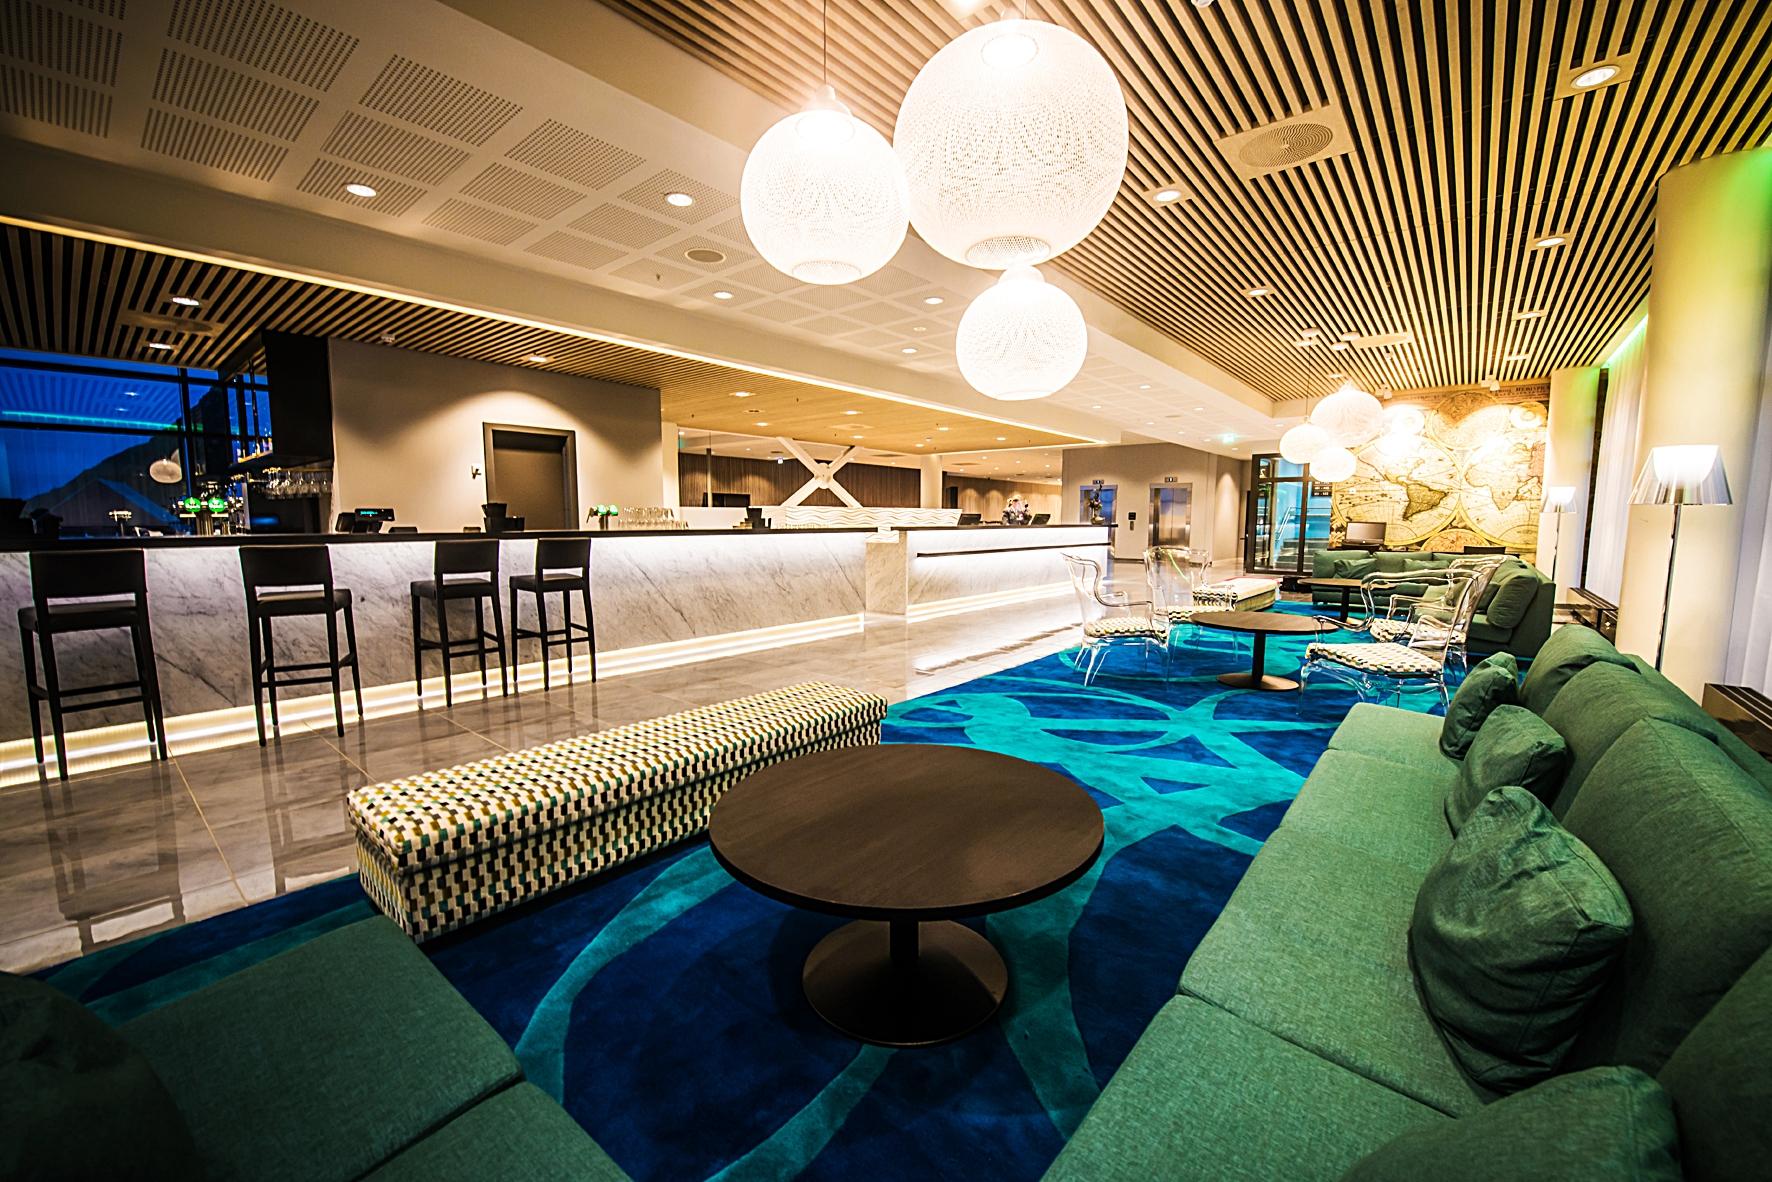 Thon Hotel Fosnavåg - Sunnmøre